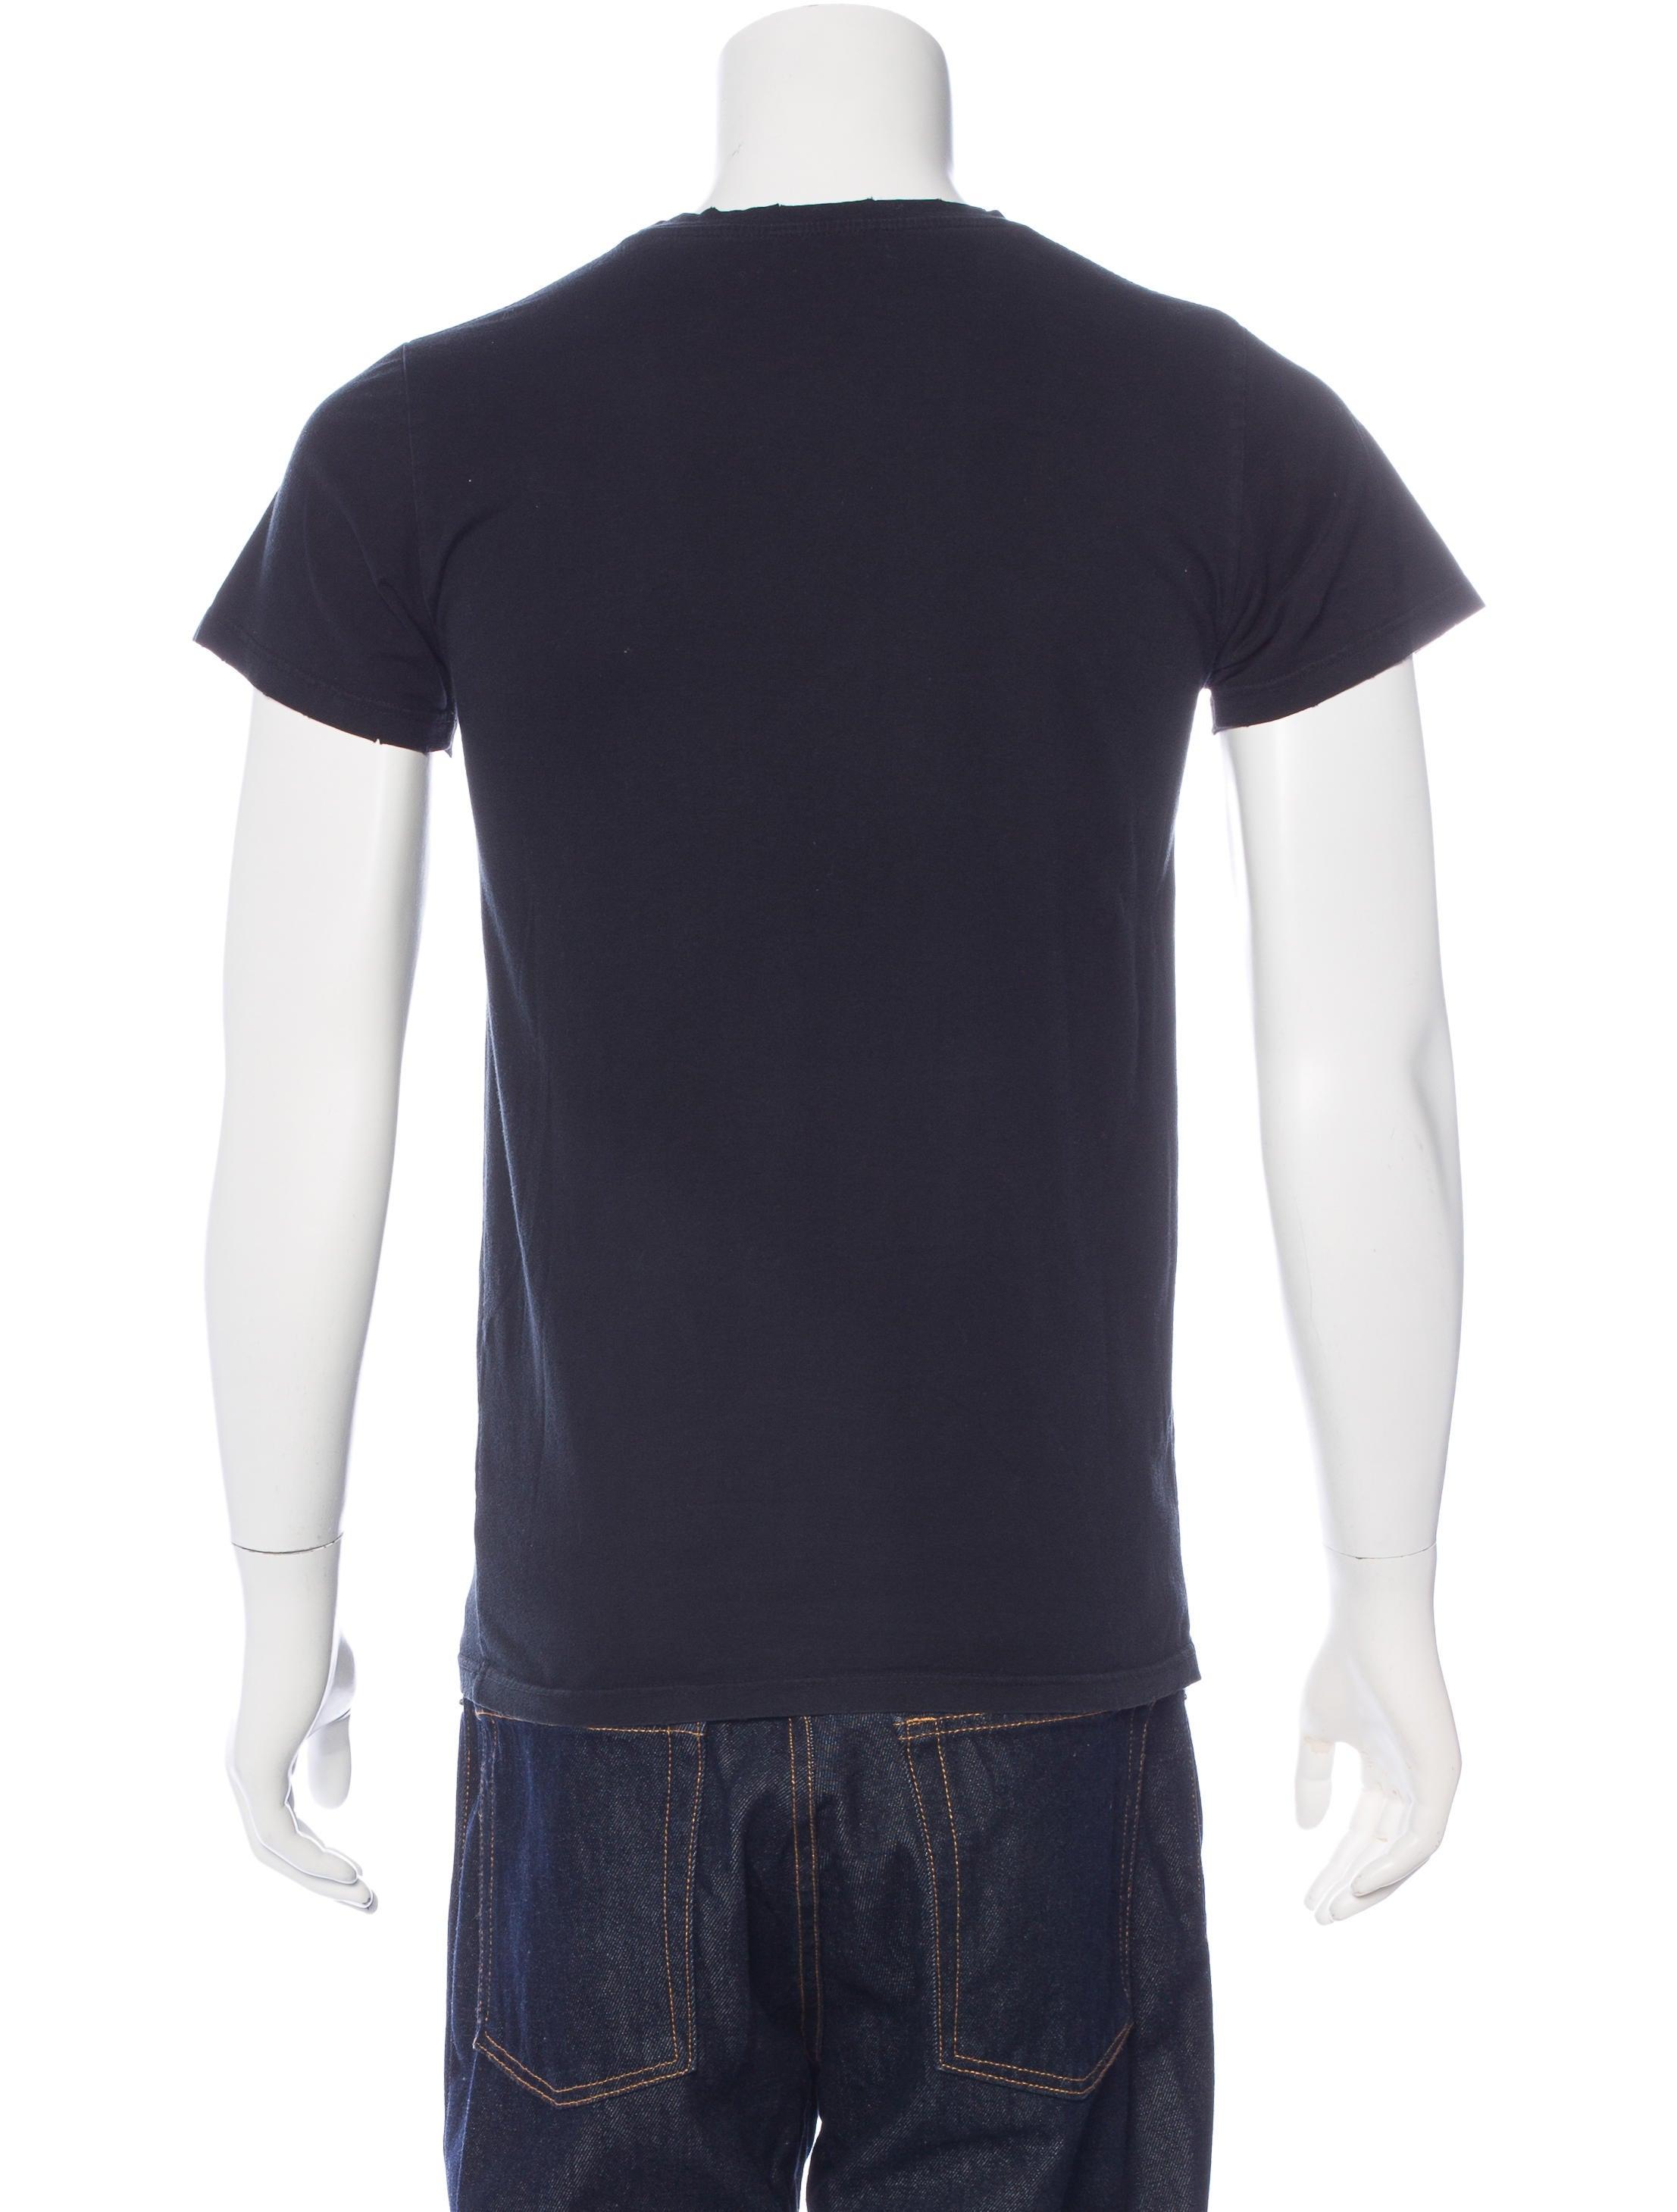 Balmain dragon phoenix t shirt clothing bam23524 for Phoenix t shirt printing